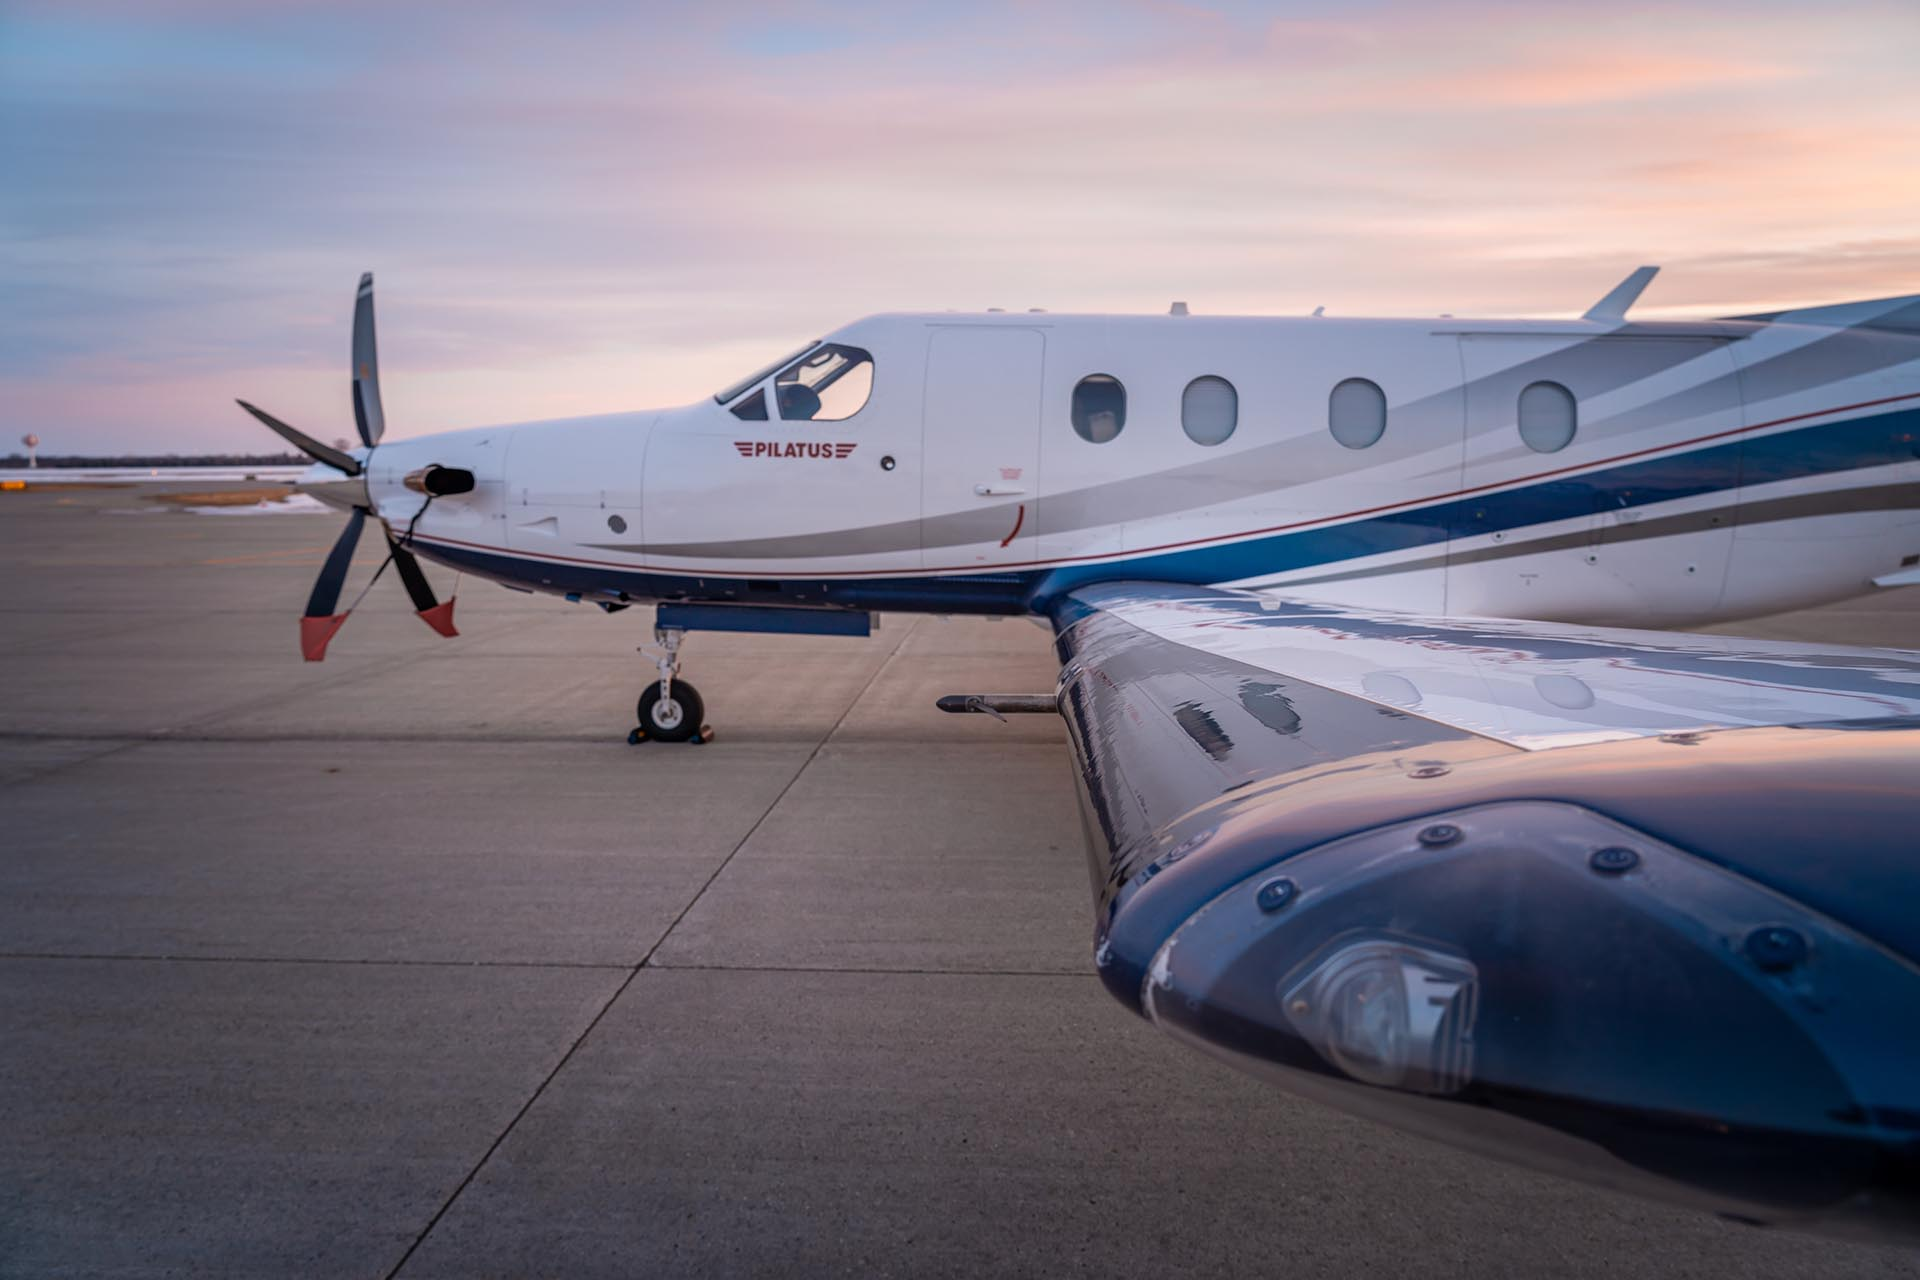 fargo jet center pc-12 pilatus aircraft